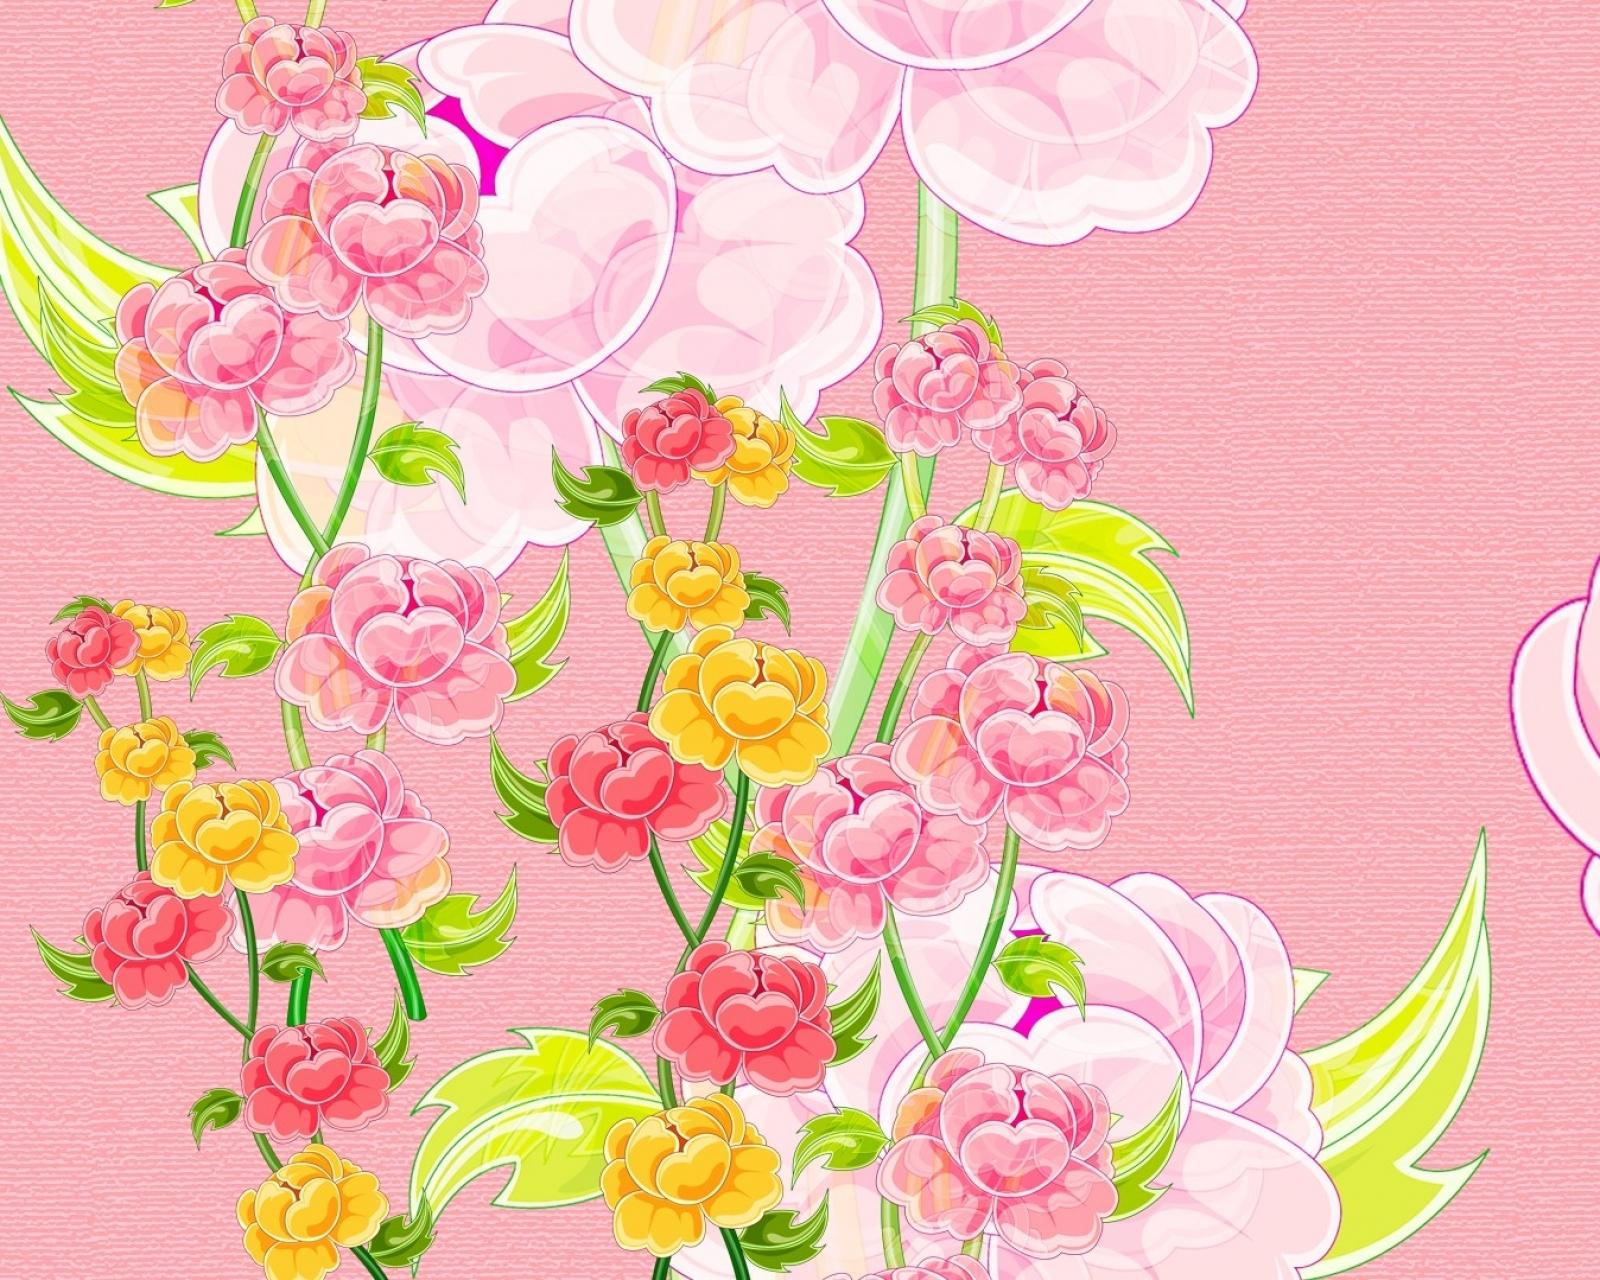 Wallpaper 135789